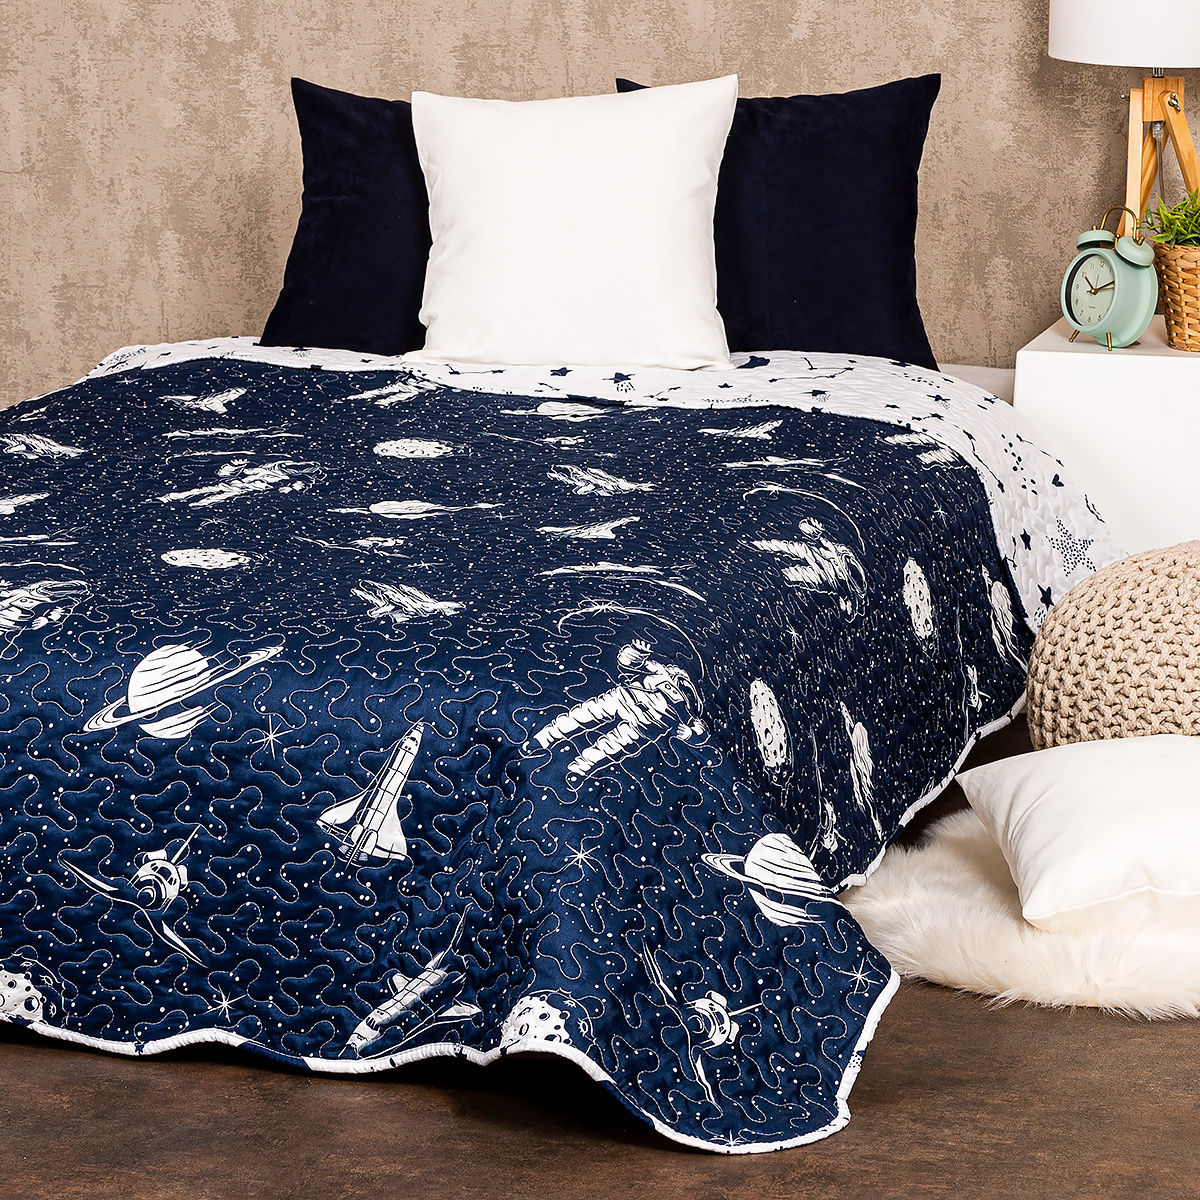 4Home Narzuta na łóżko In Space, 140 x 220 cm